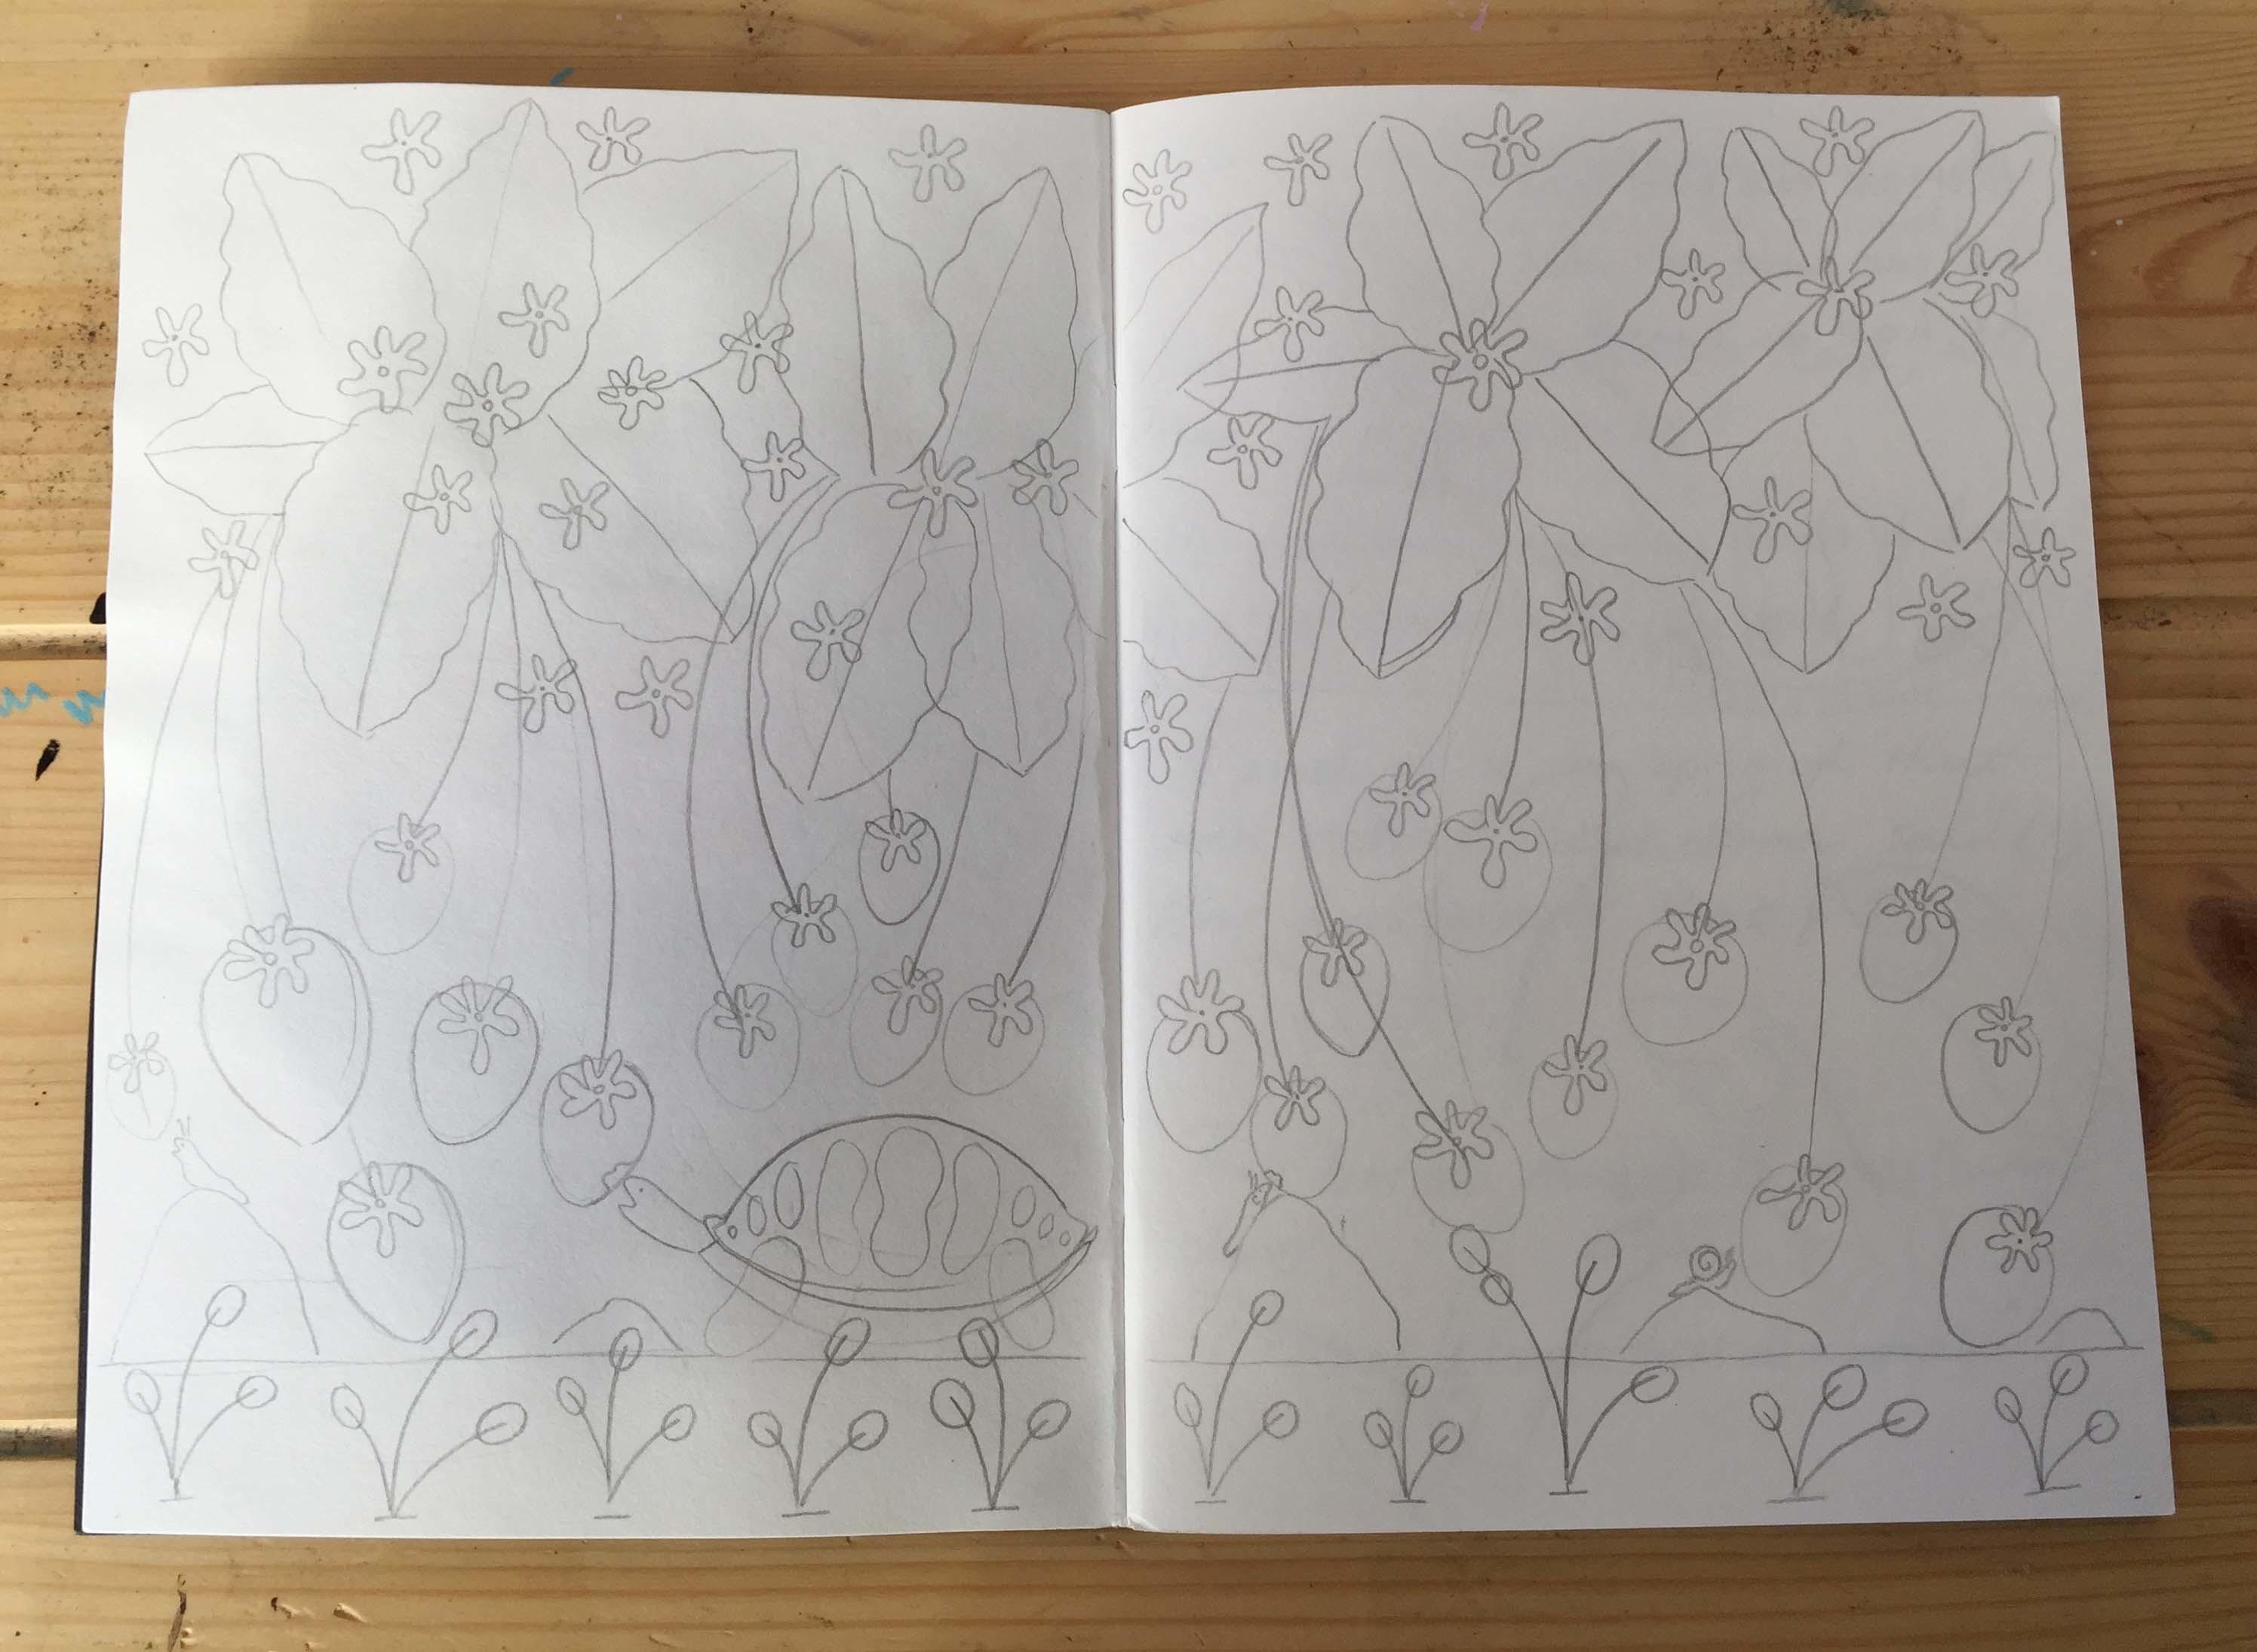 Tortoise-Sketch-1.JPG#asset:279